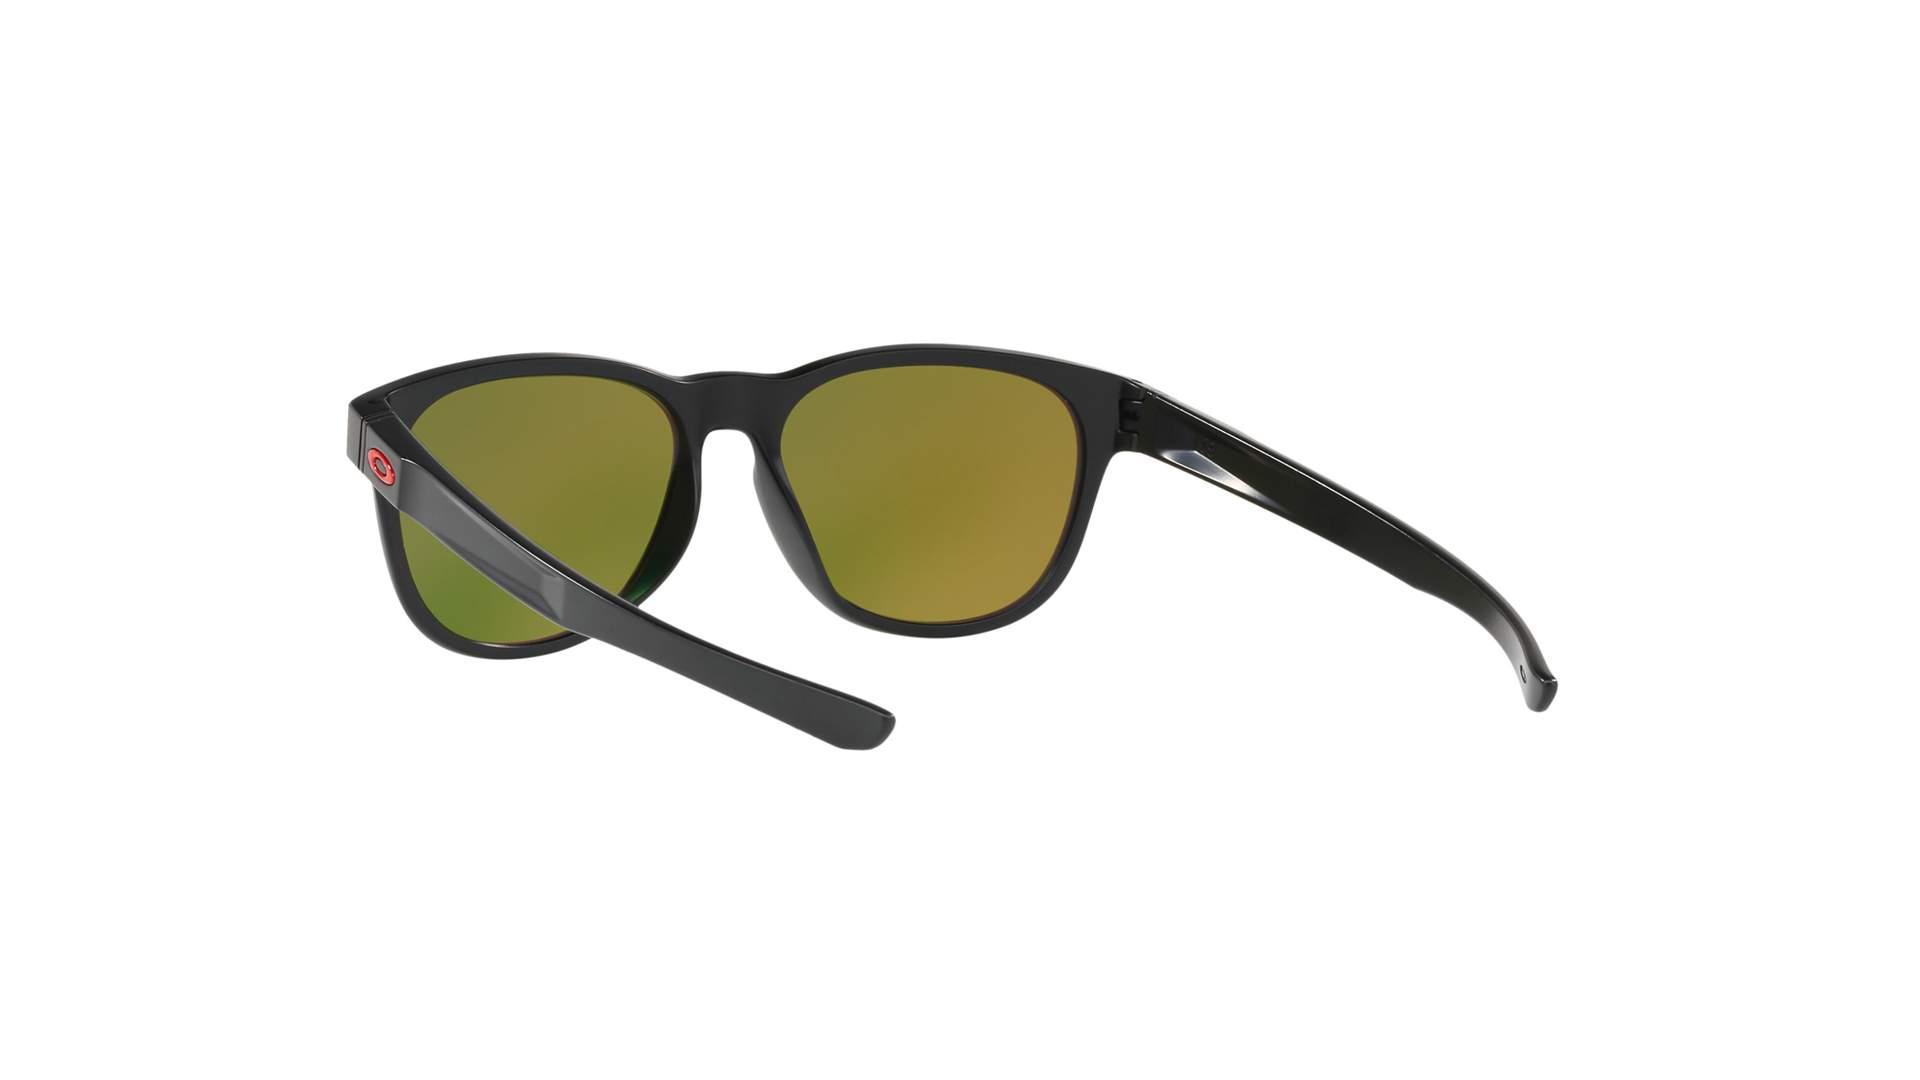 8609146ebc Sunglasses Oakley Stringer Ruby Black Matte Prizm OO9315 16 55-16 Medium  Mirror